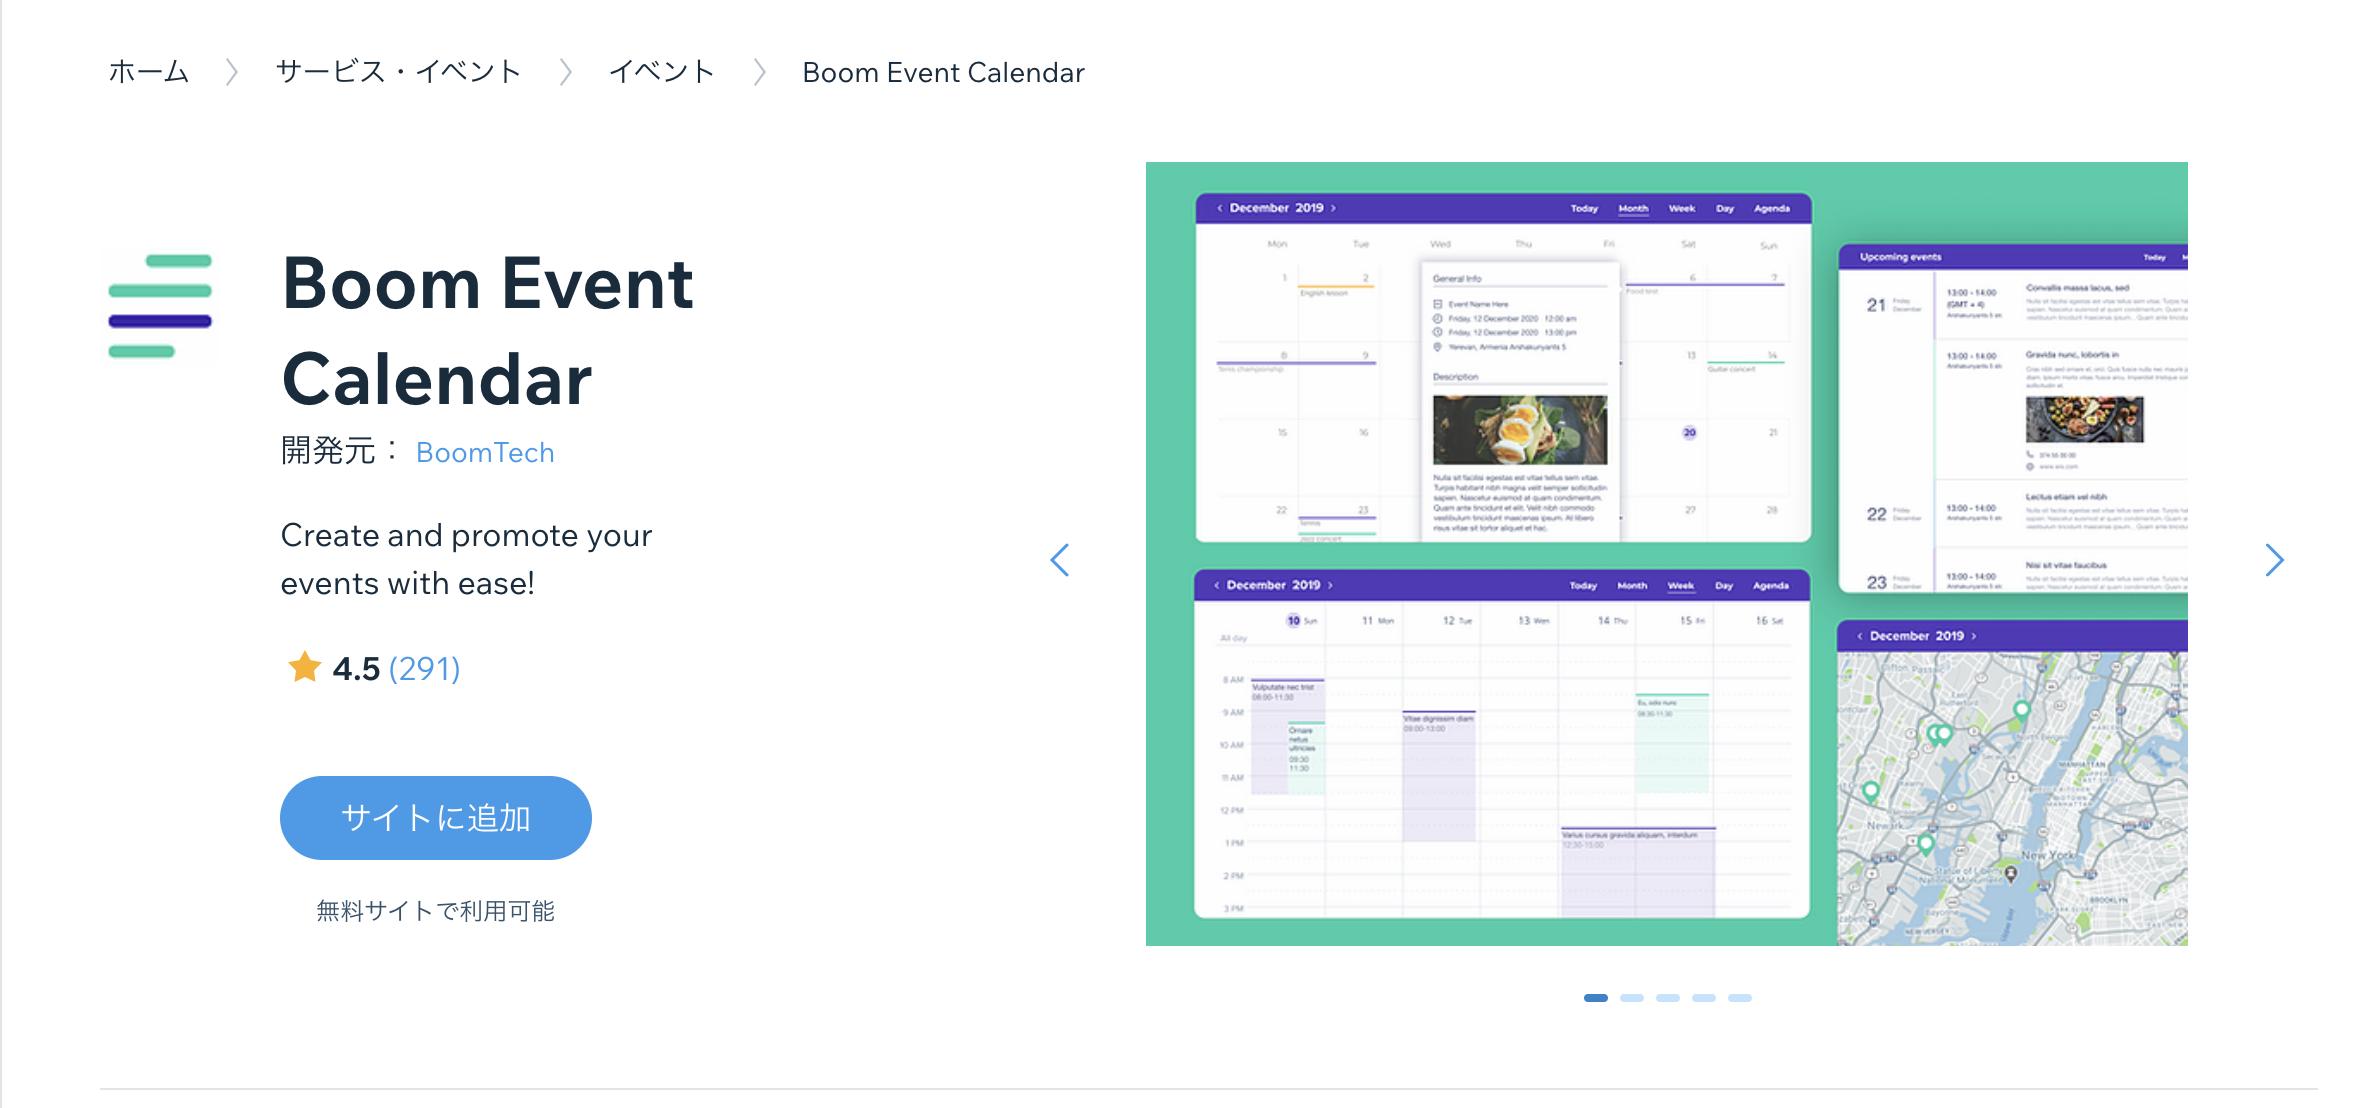 wixアプリおすすめBoom Event Calendar